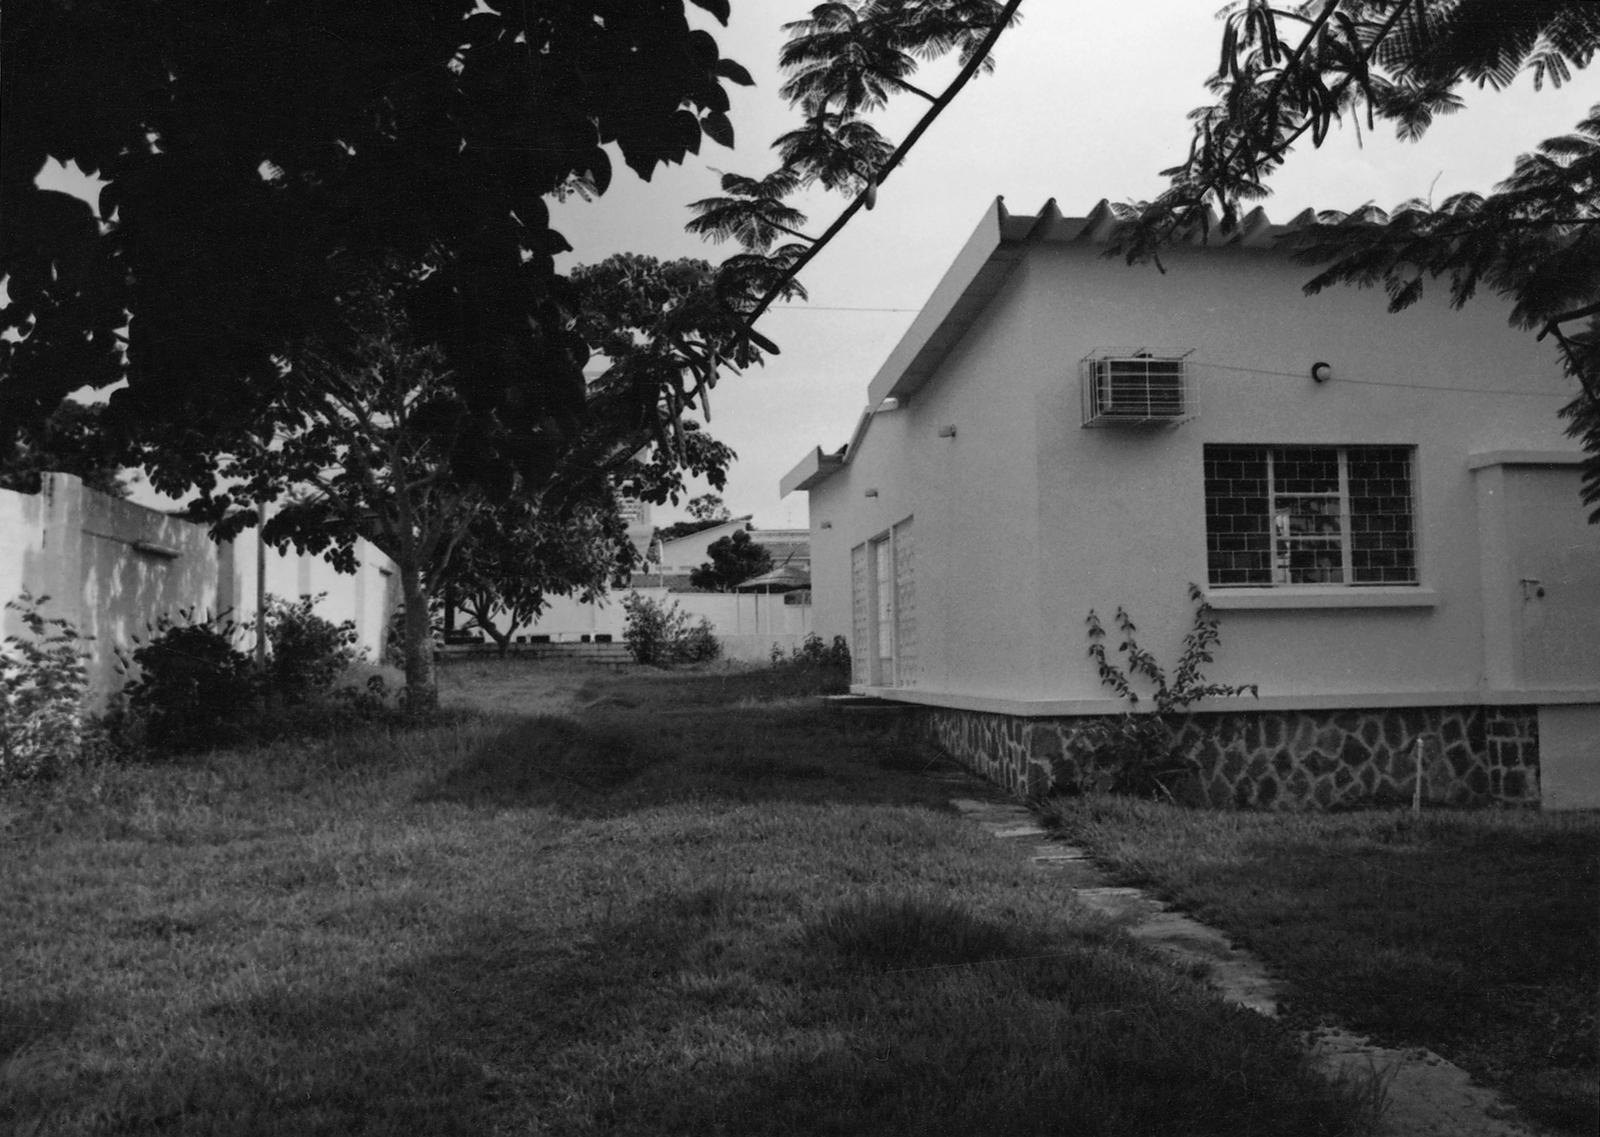 Kinshasa - Mid-Level Position Residence - 1979